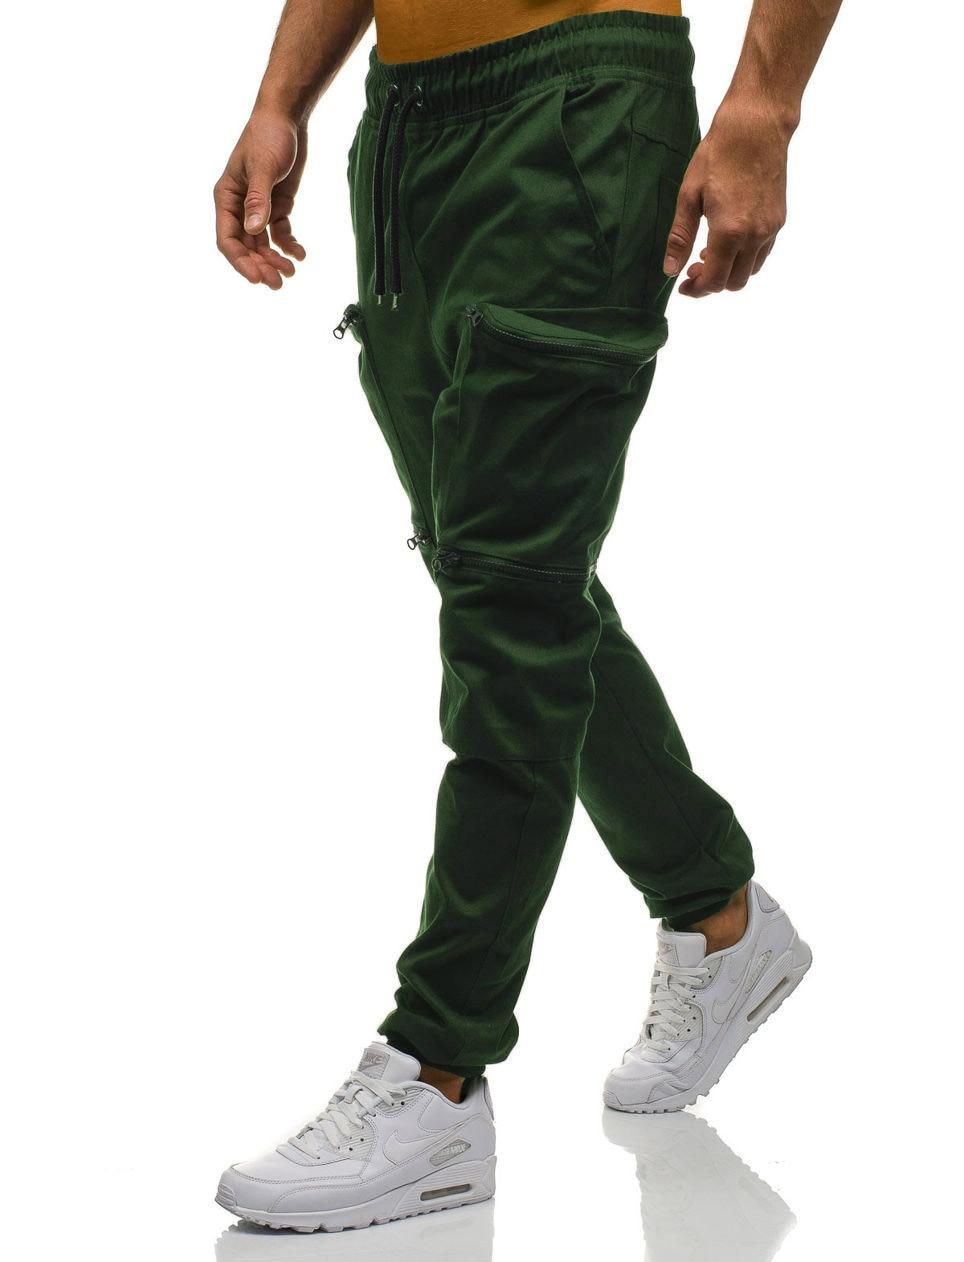 HTB1VevqL7voK1RjSZFwq6AiCFXaJ Mens Joggers 2019 New Red Camouflage Multi-Pockets Cargo Pants Men Cotton Harem Pants Hip Hop Trousers Streetwear XXXL